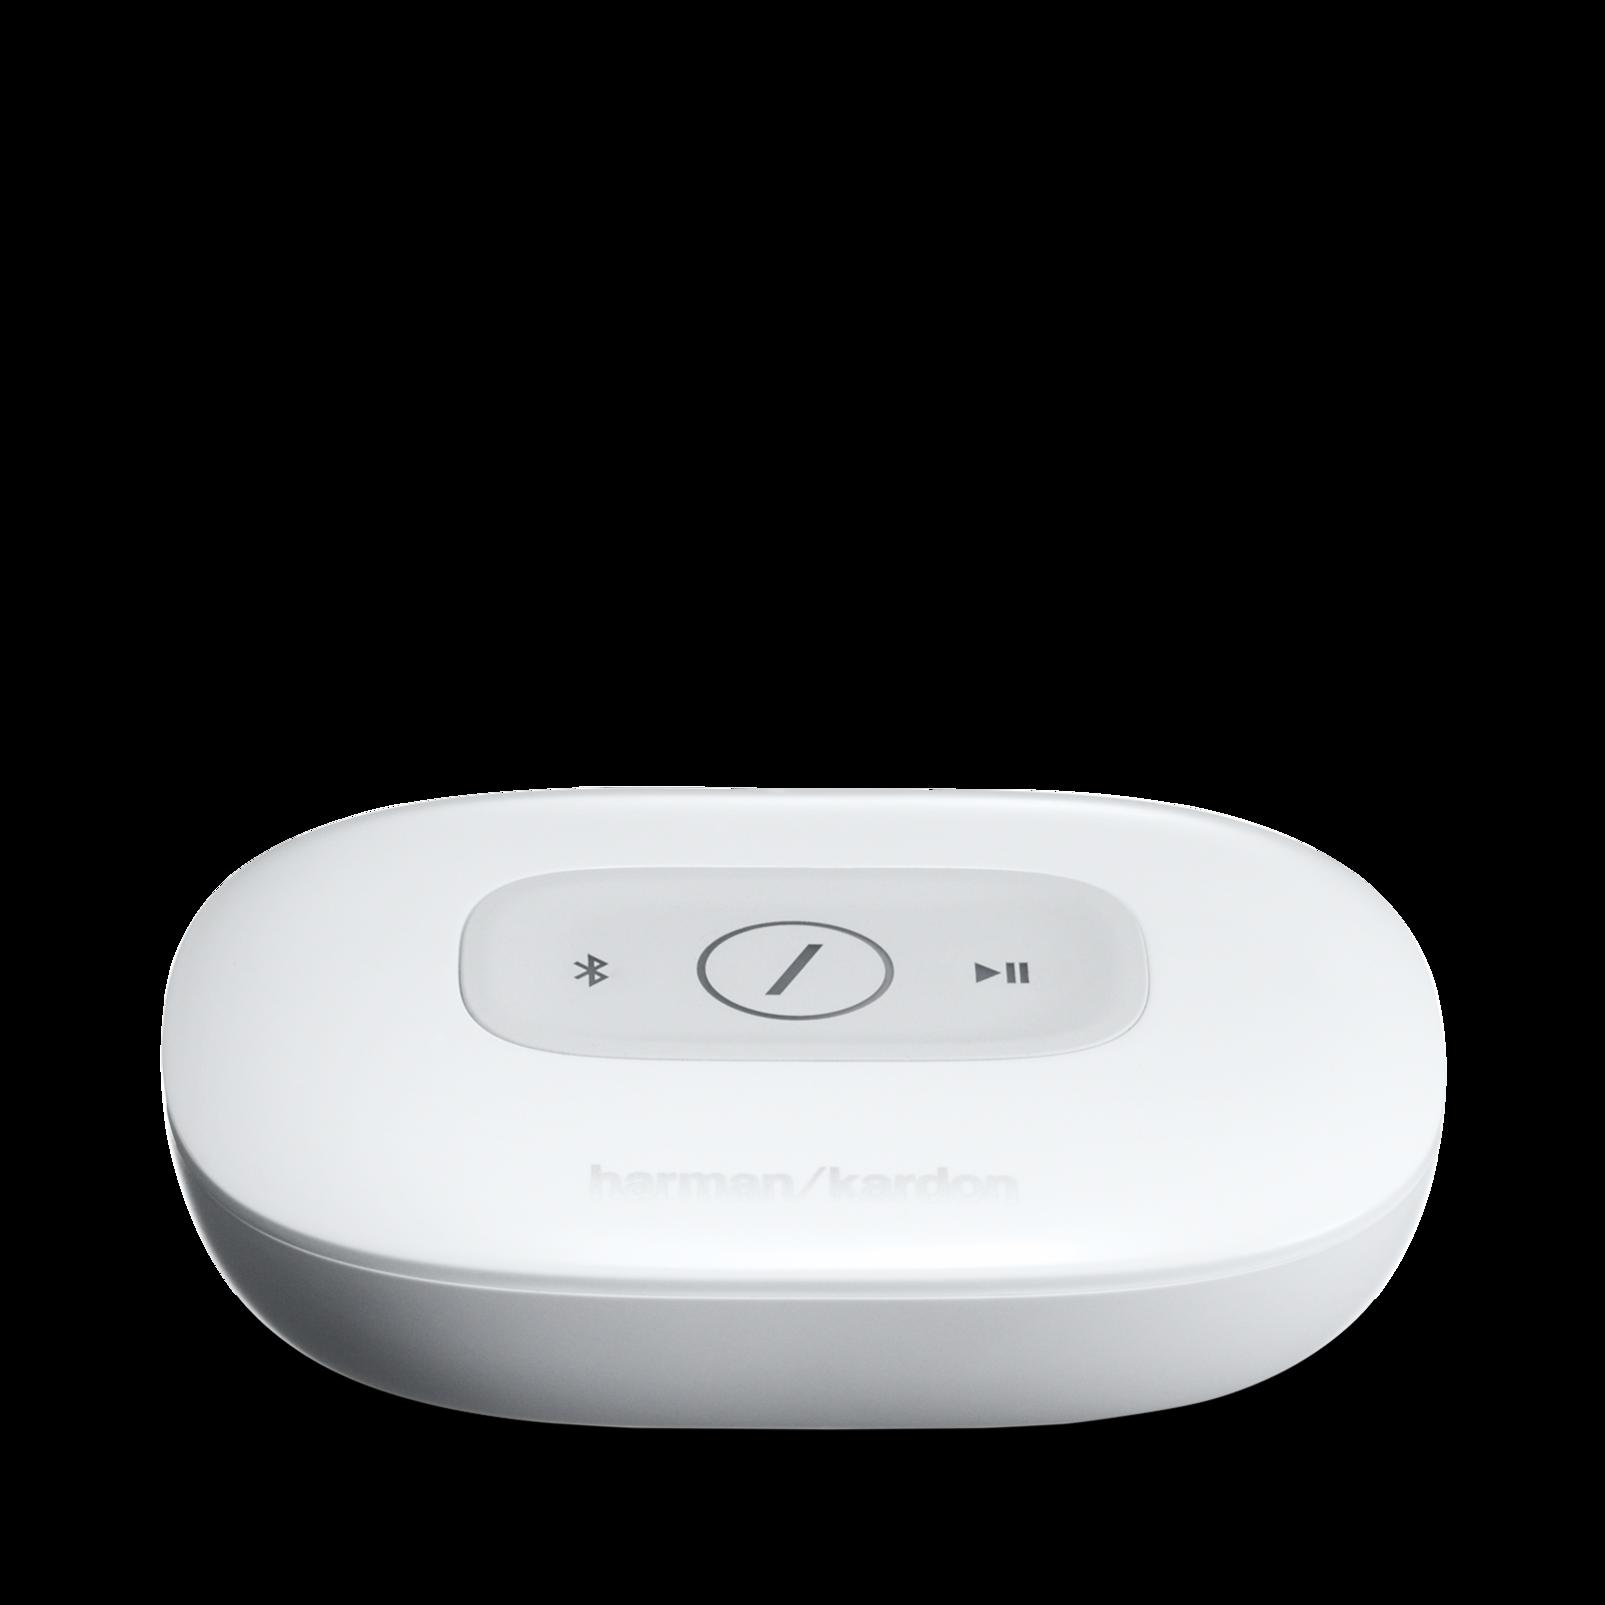 Harman Kardon Adapt HD Audio Wireless Adaptor with Bluetooth,  $12.95 + Free Shipping.